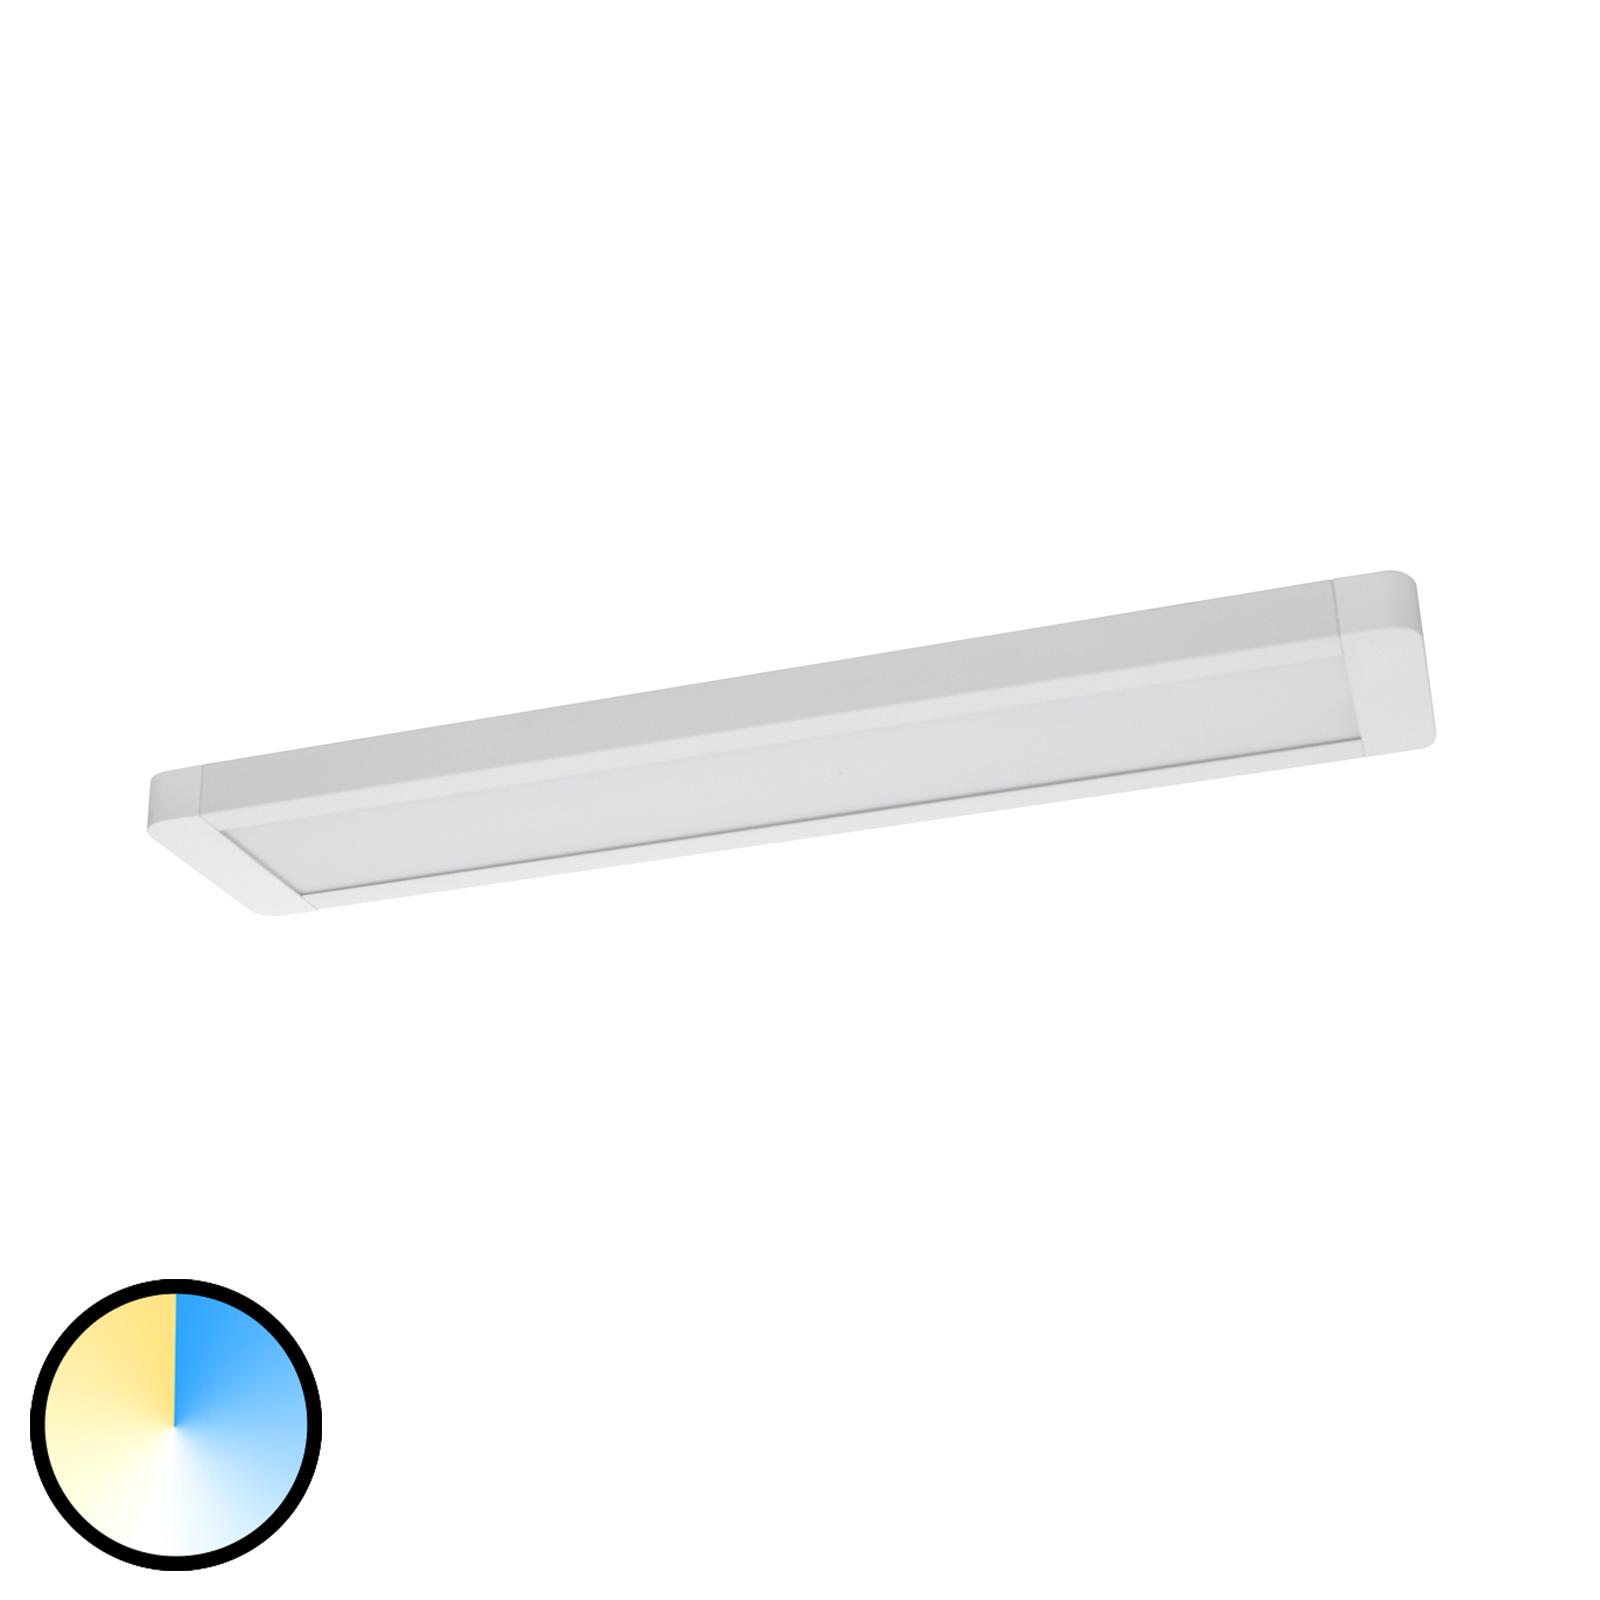 LEDVANCE Office Line LED-Deckenleuchte 60 cm